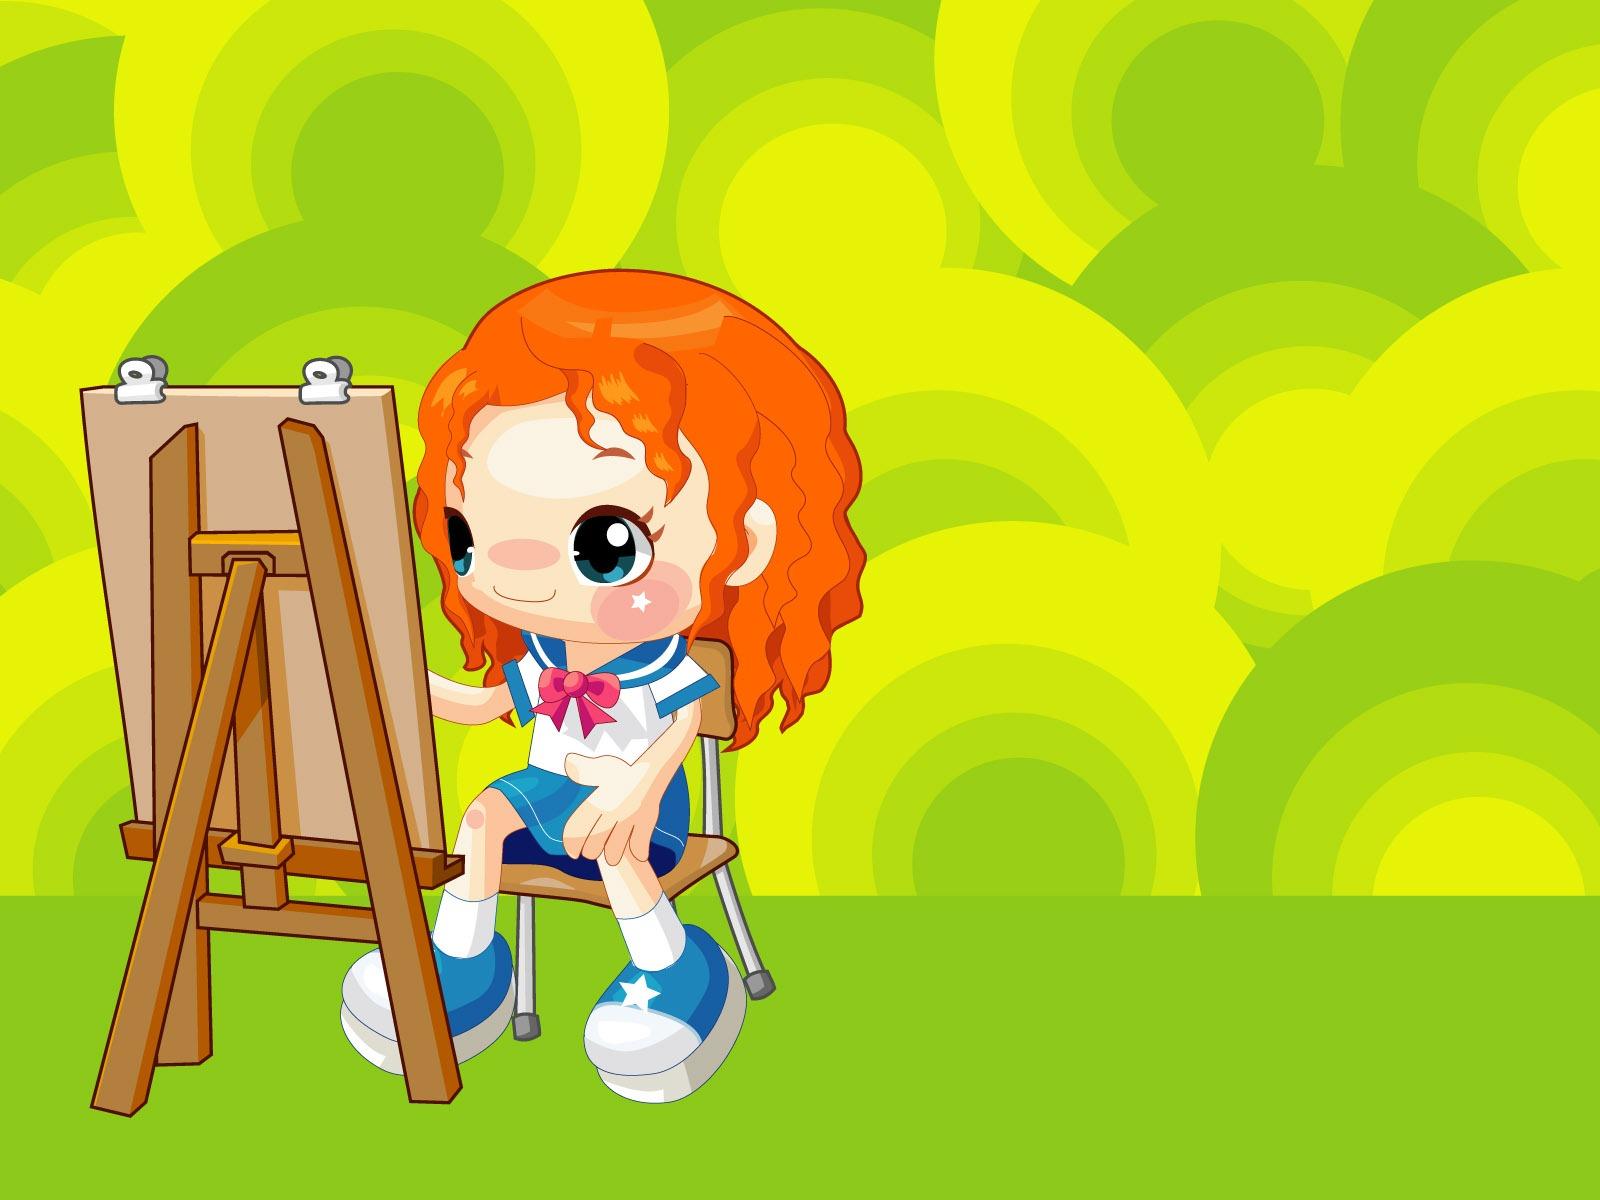 Descripción : Dibujos animados infantiles Fondos de vectores (1) #9